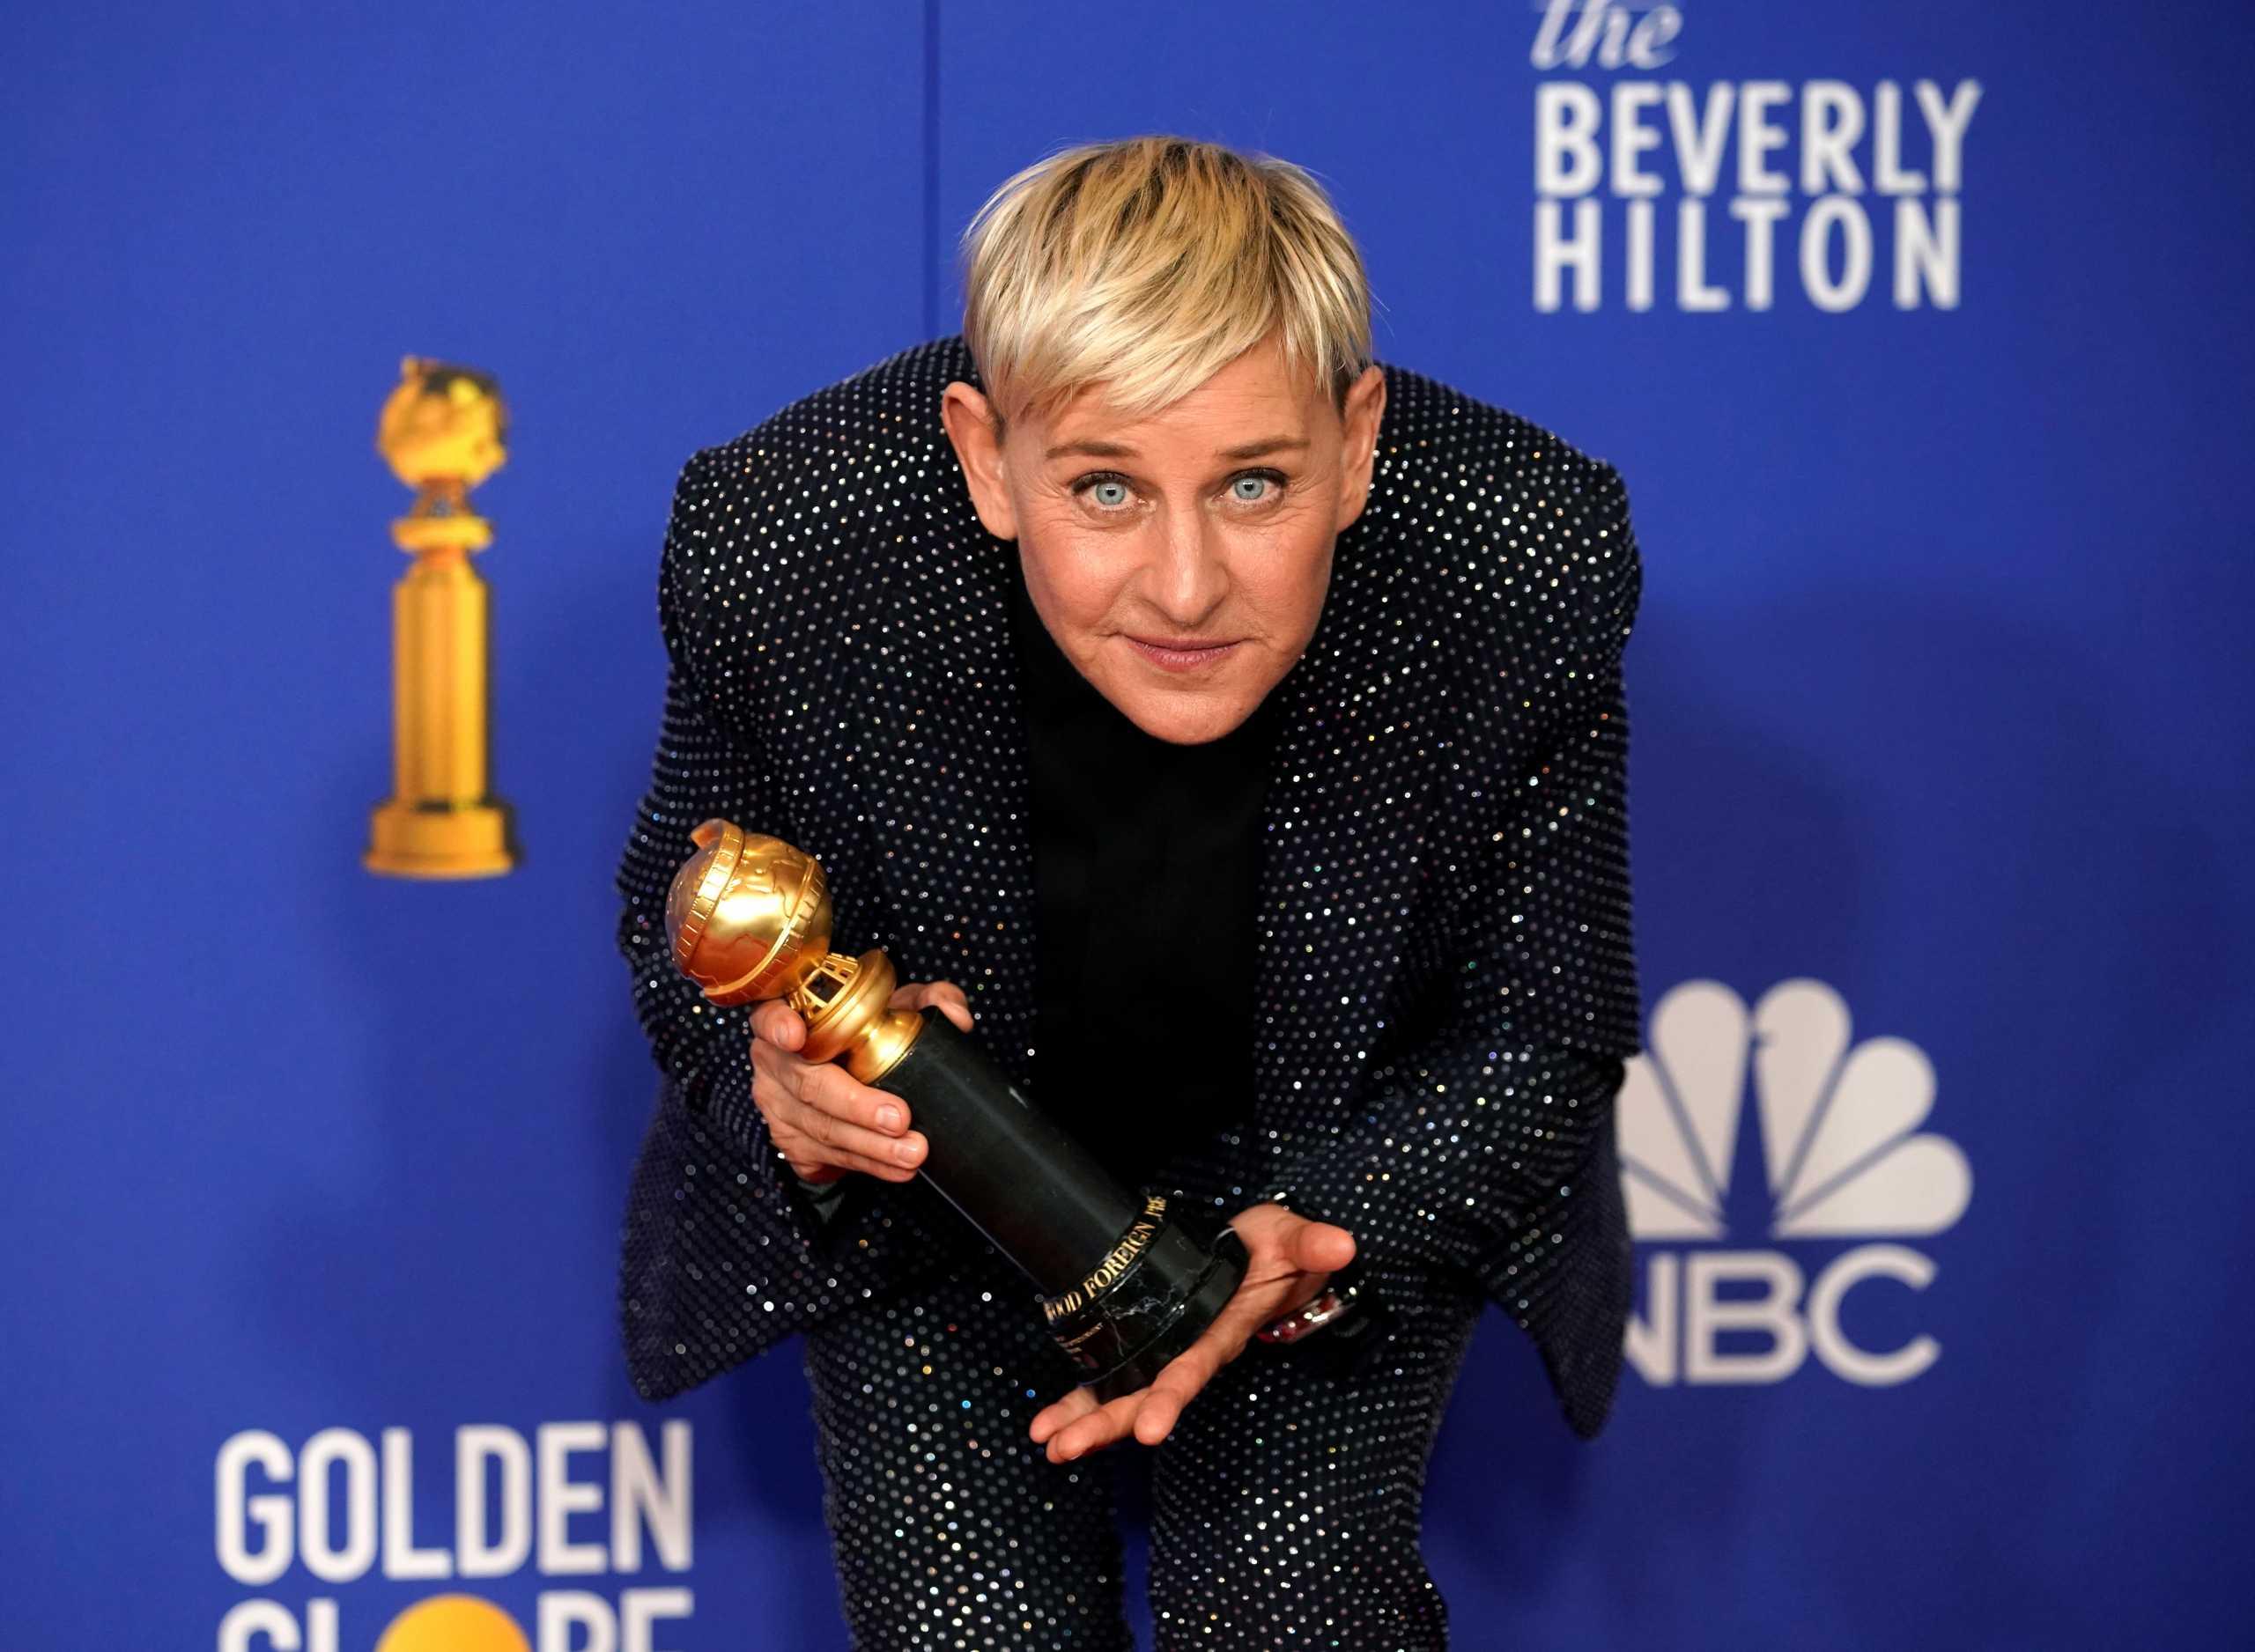 Ellen DeGeneres: Με καλεσμένη την Oprah θα αποκαλύψει γιατί σταματάει το show της